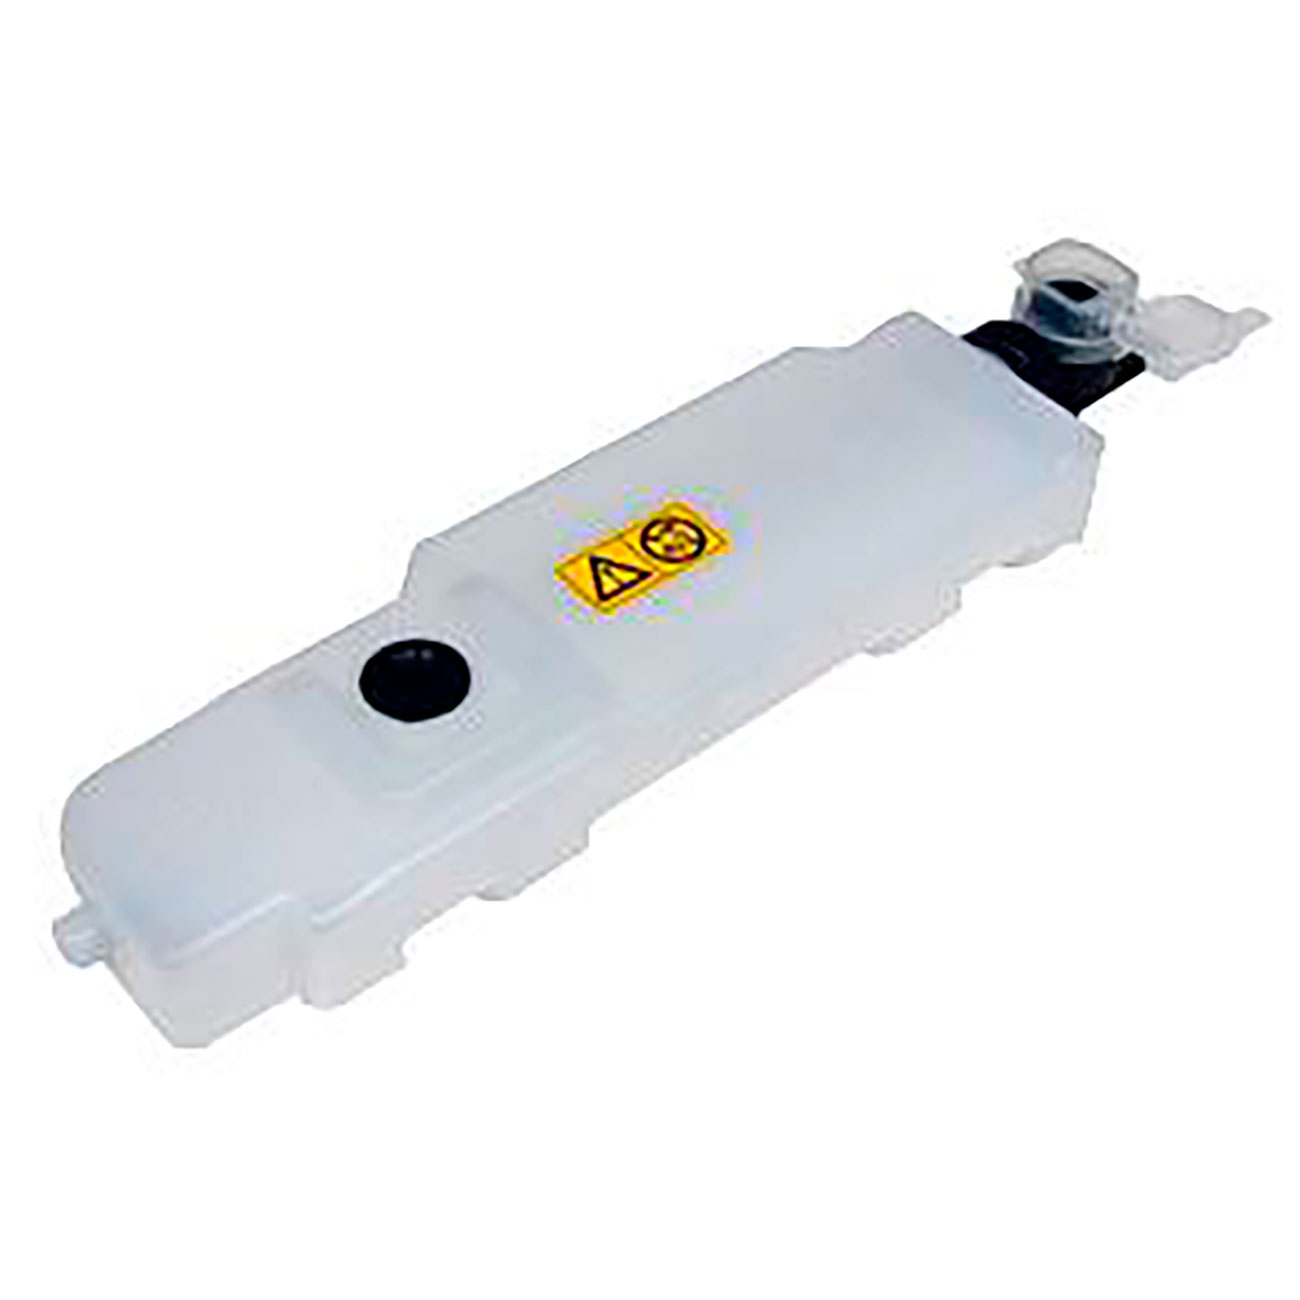 Фото Бункер отработанного тонера Katun WT-860 для Kyocera FS-C8600/8650/TASKalfa 3050ci/3051ci/ 3501i/3550ci/3551ci/ 4500i/4501i/4550ci/4551ci {39511}